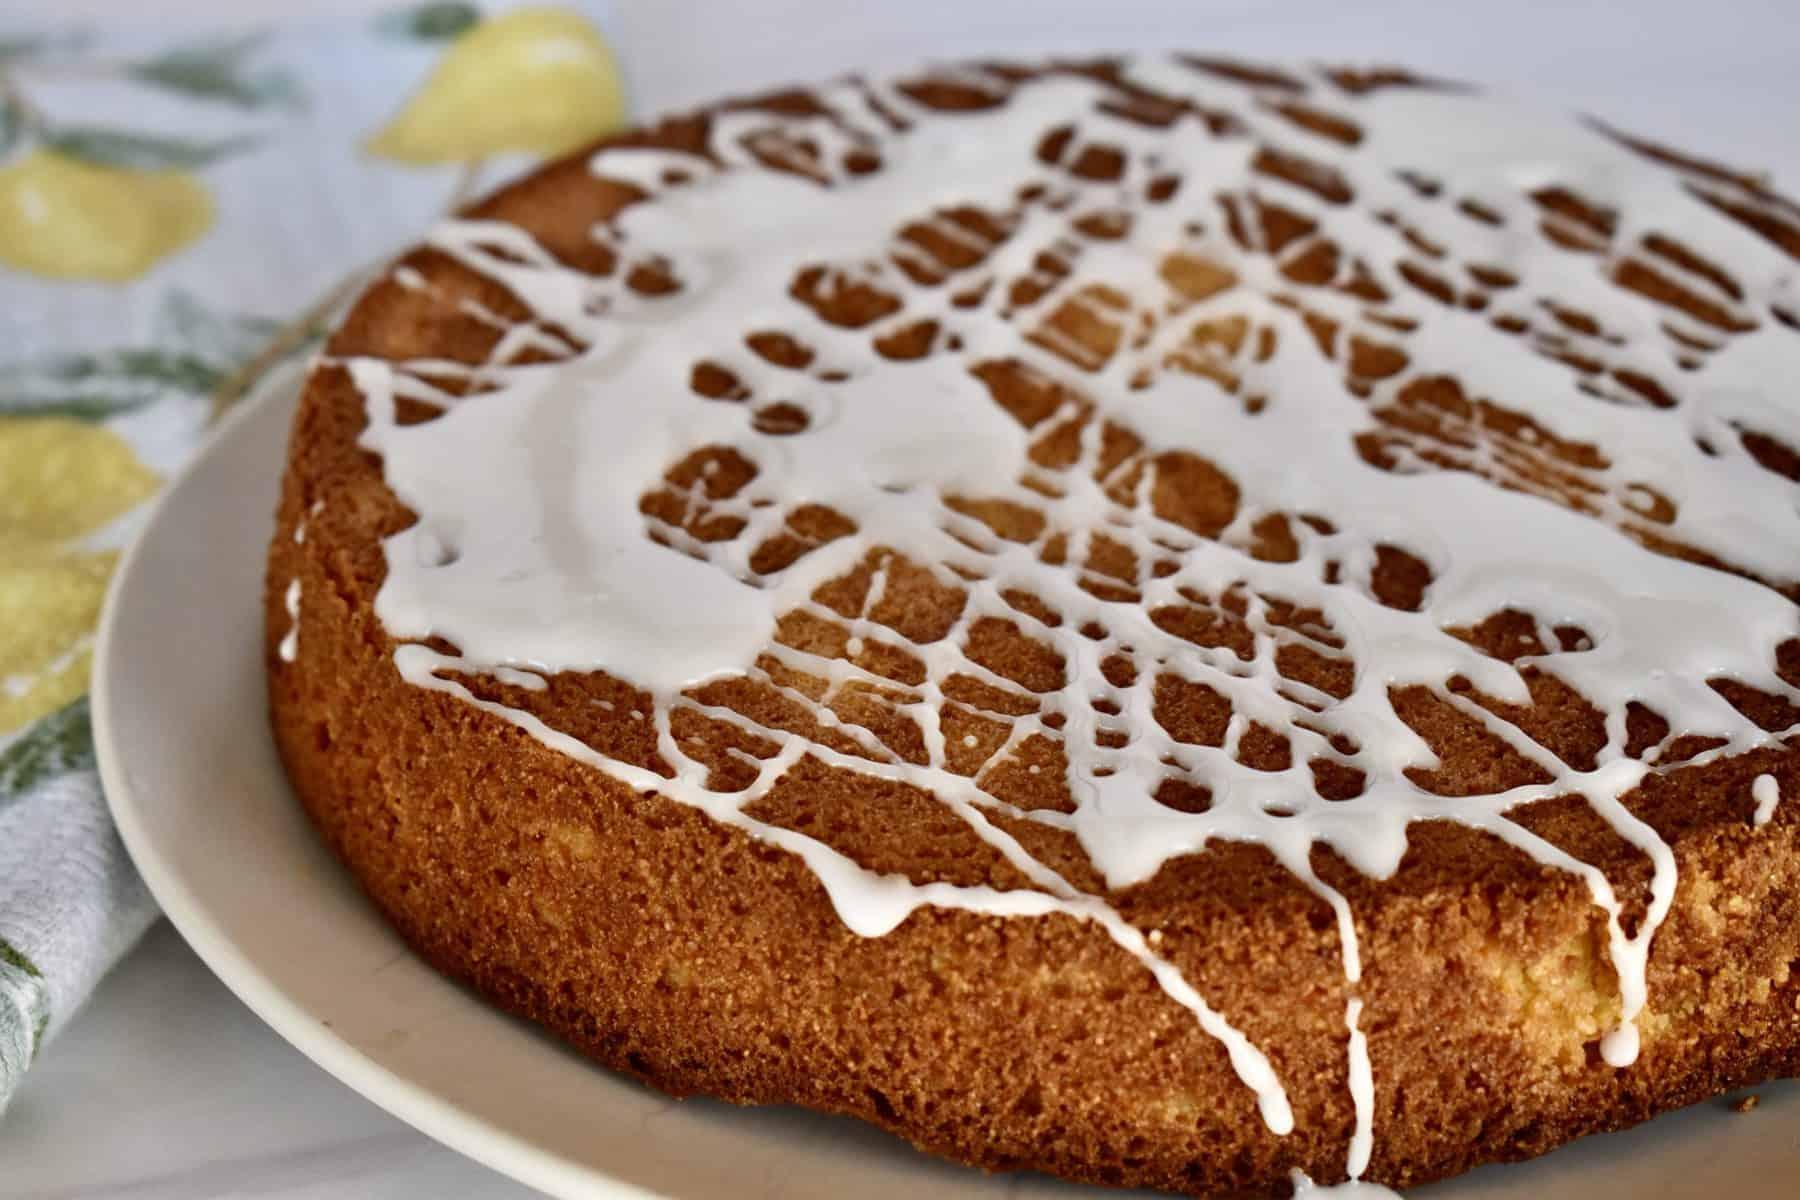 Lemon Polenta Cake with lemon glaze.